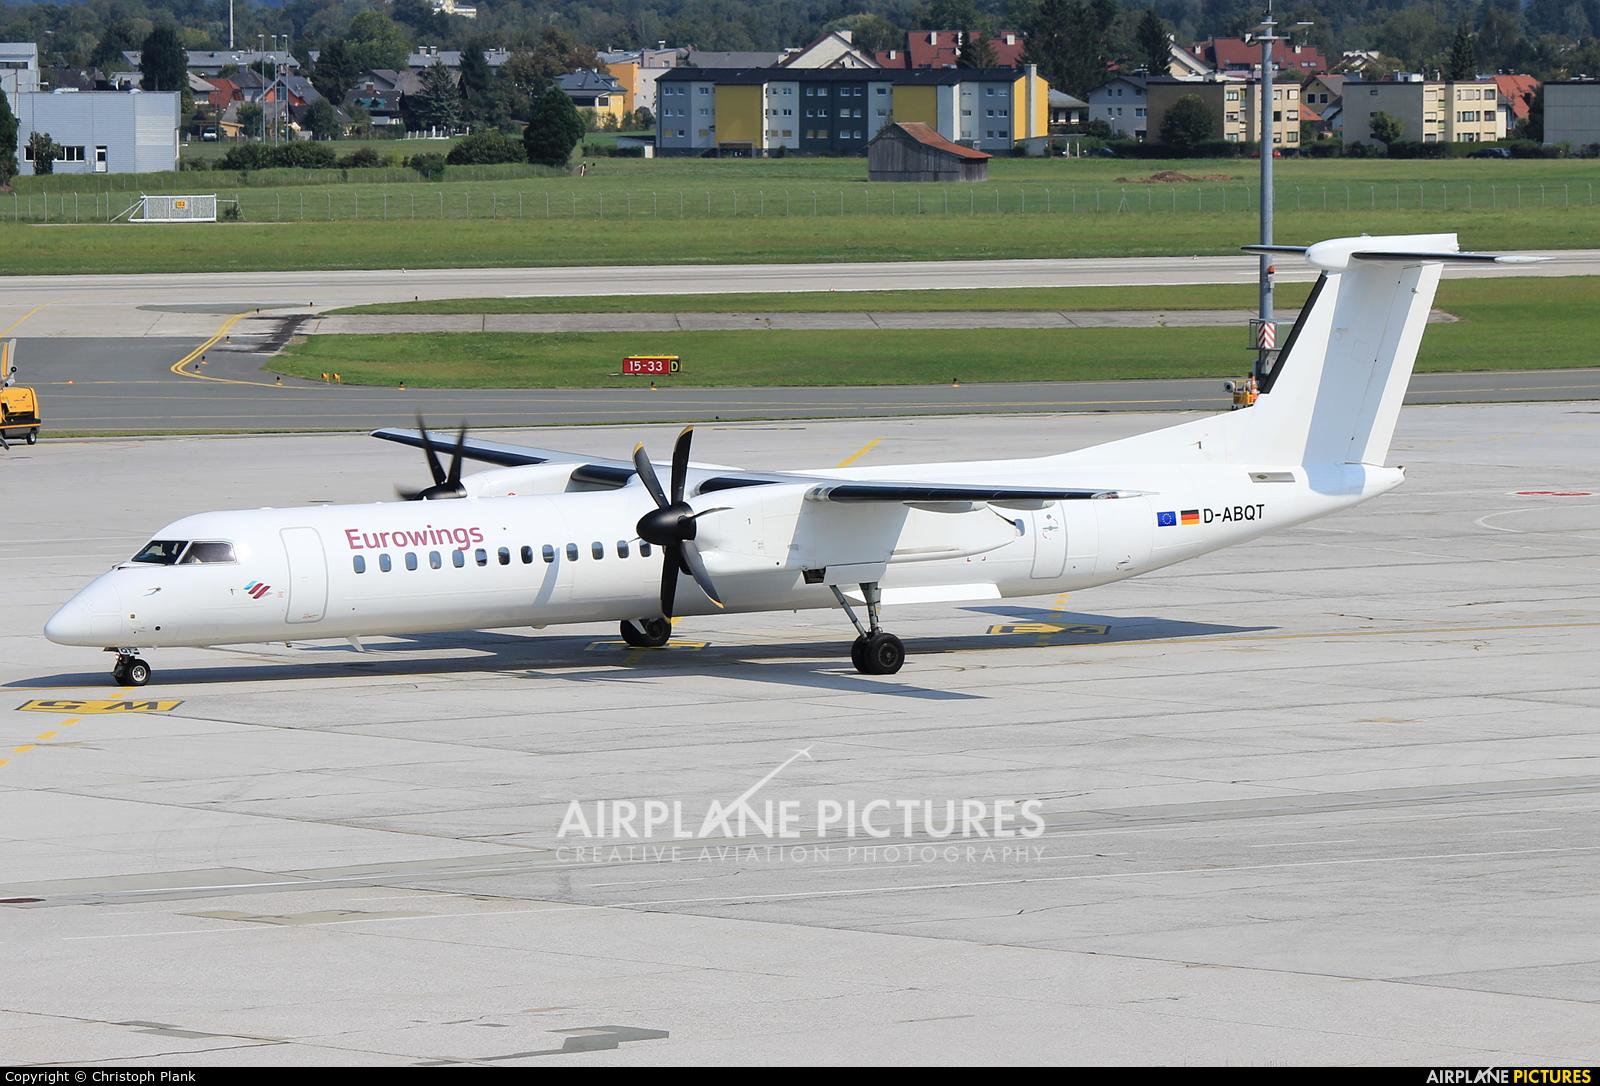 Eurowings D-ABQT aircraft at Salzburg